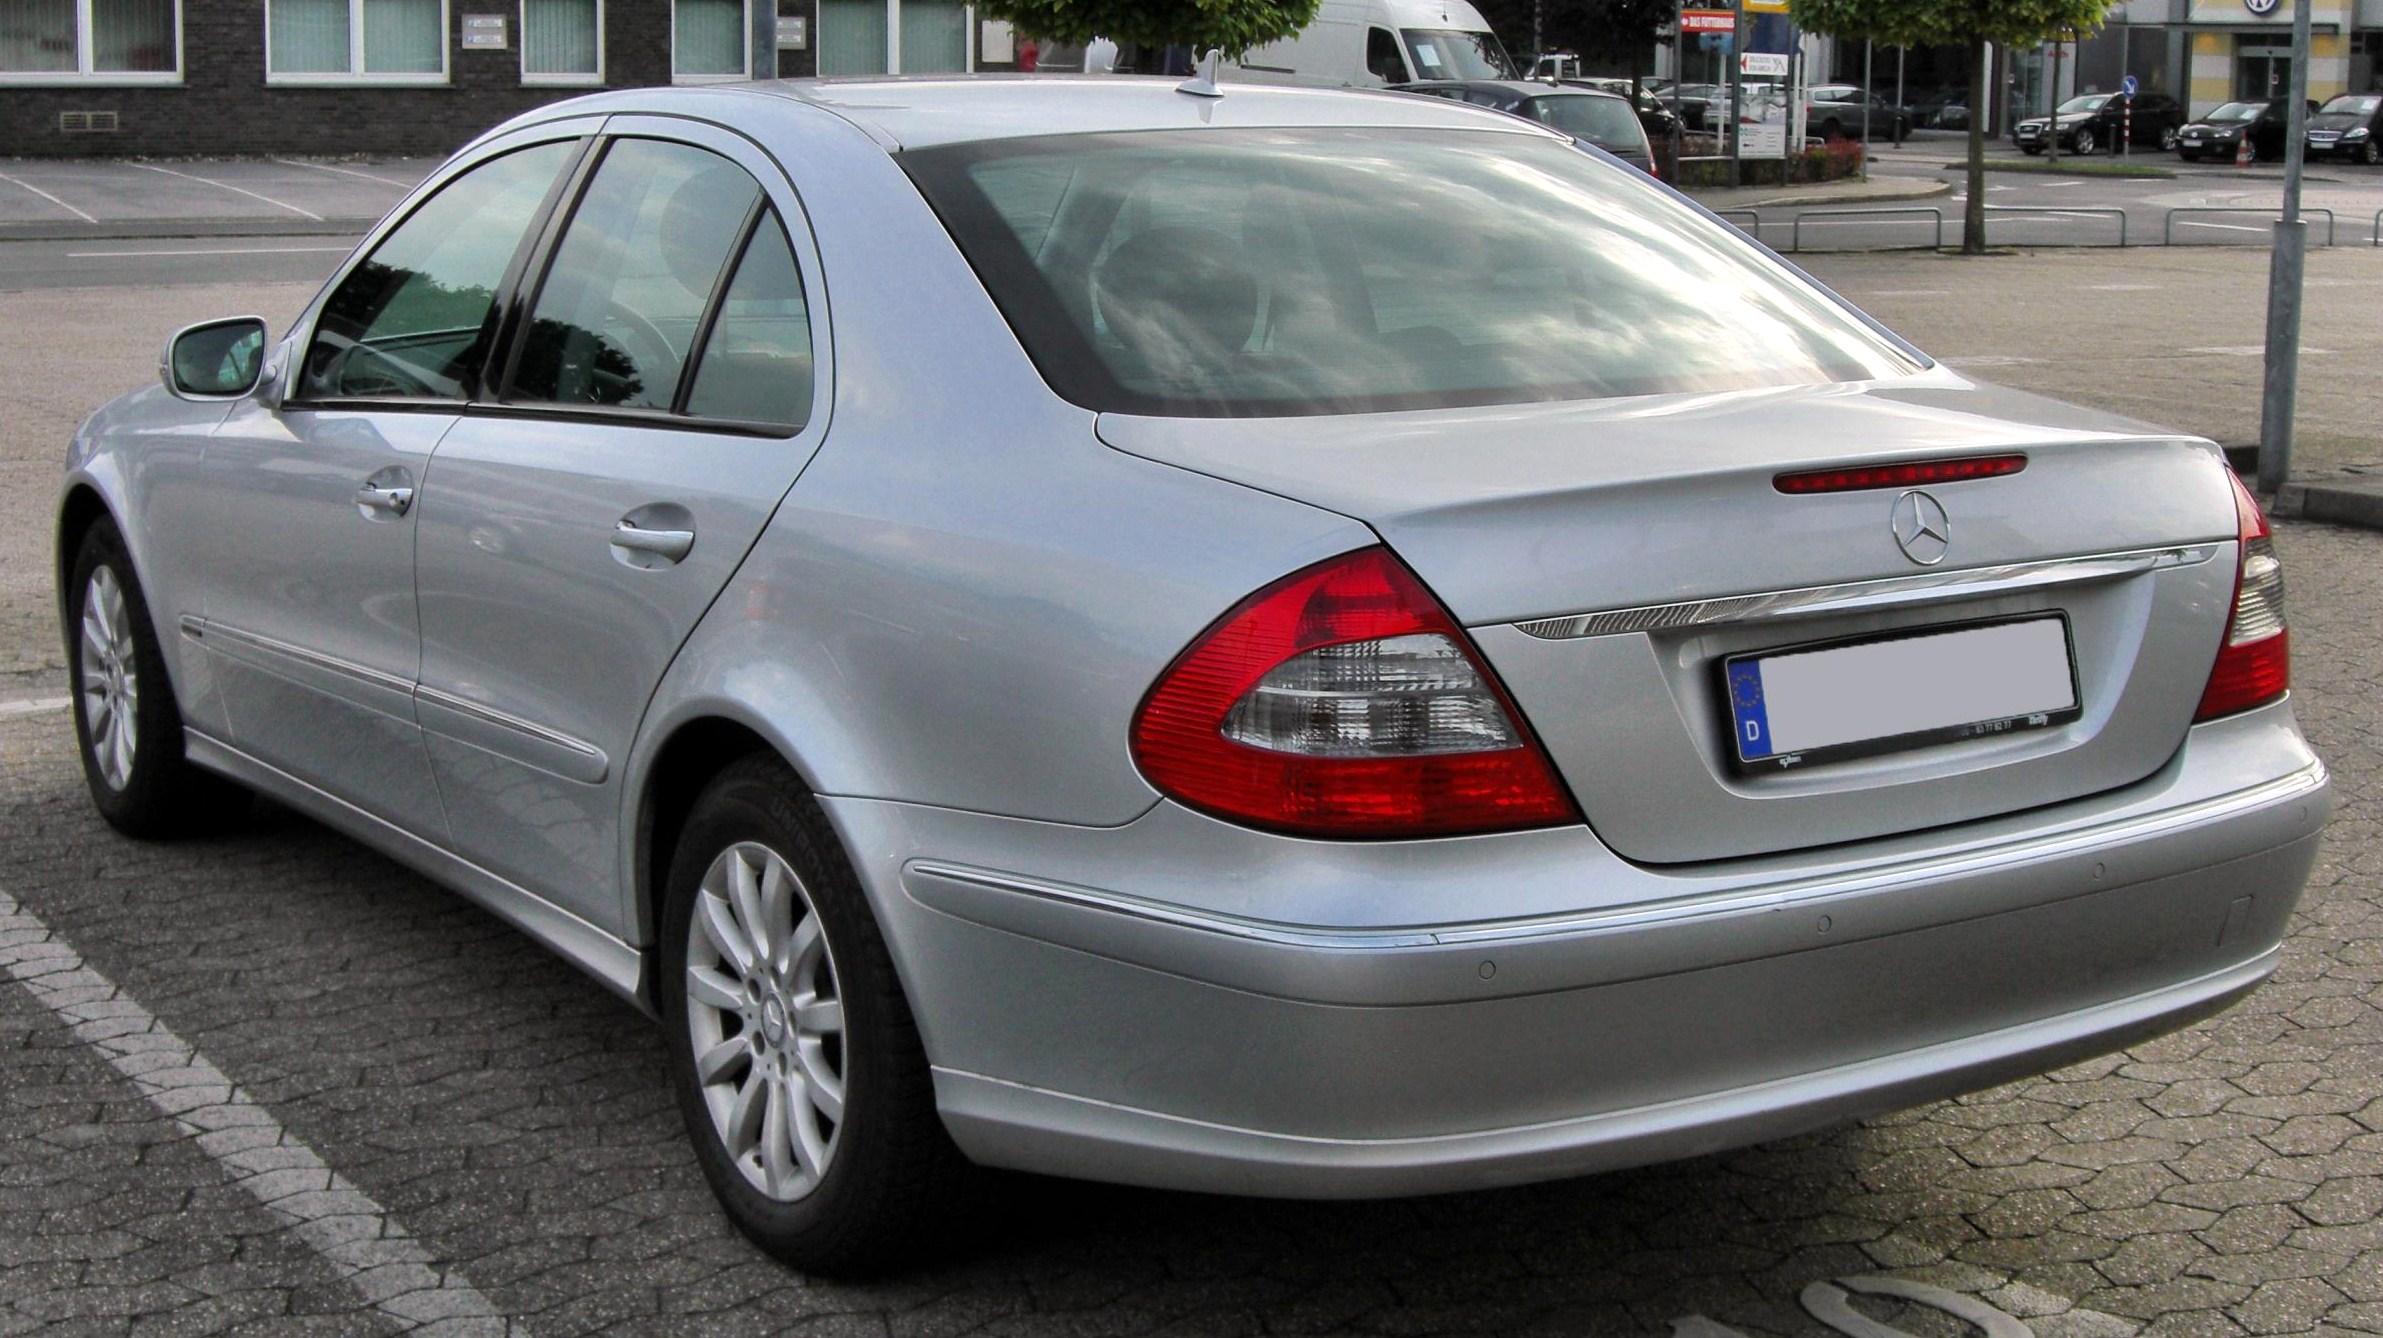 Mercedes E Class Cabriolet Used Car